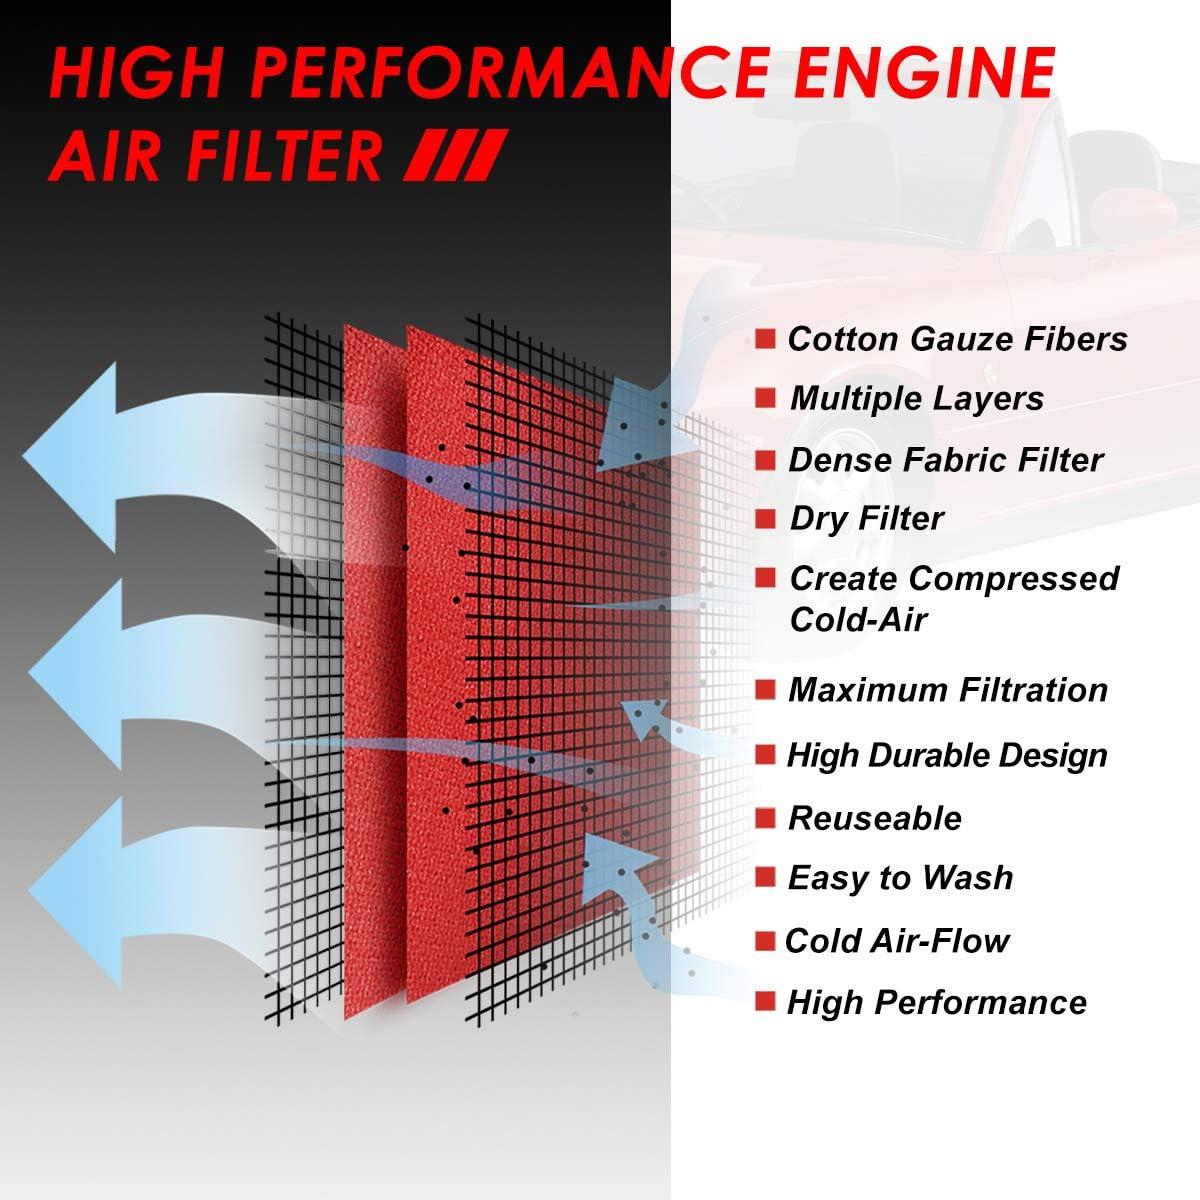 FOR 90-97 FORD ESCORT MAZDA MX-5 MIATA PROTEGE TRACER DROP-IN PANEL AIR FILTER